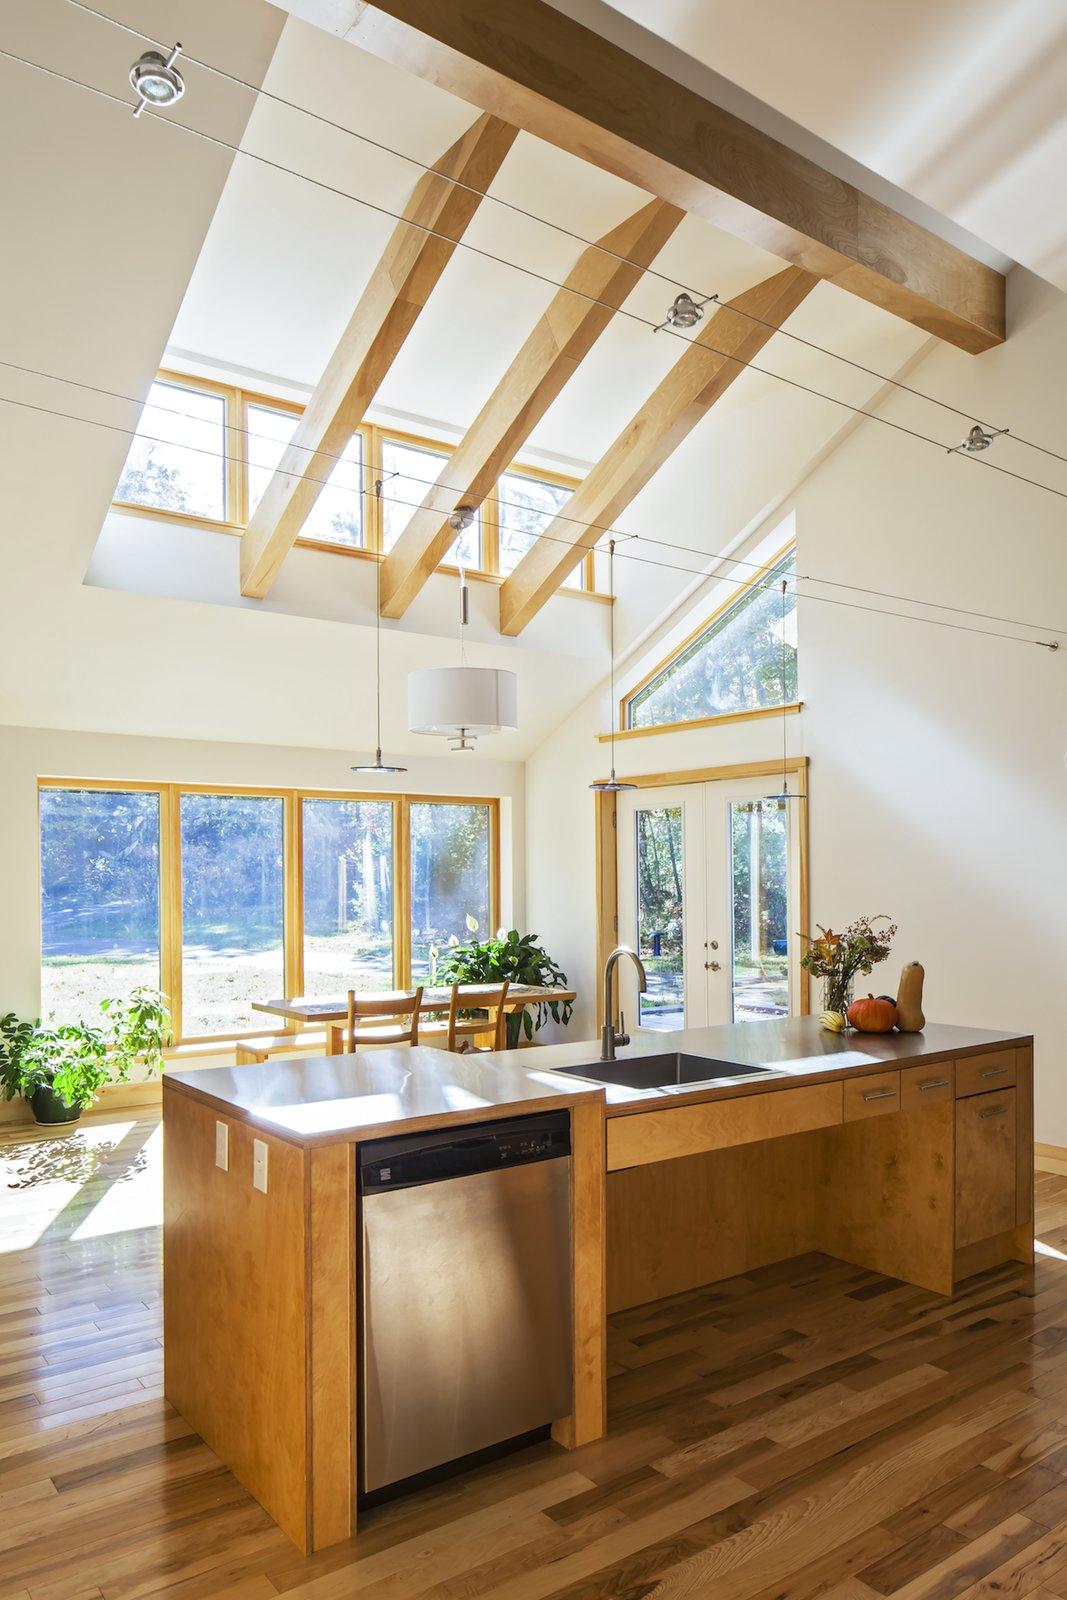 Kitchen, Metal, Wood, Medium Hardwood, Dishwasher, Pendant, Track, and Drop In Accessible Kitchen  Best Kitchen Metal Medium Hardwood Photos from Sliwinski Residence